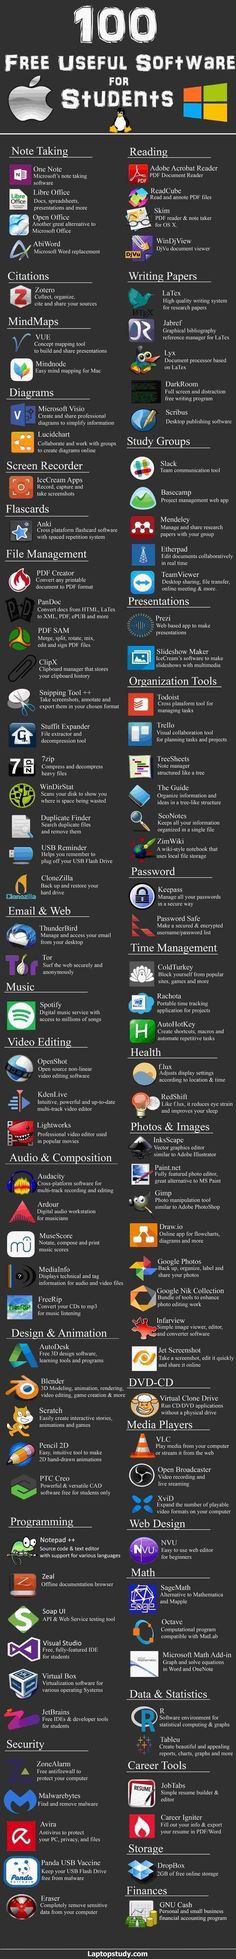 College hacks School hacks Educational websites Hacking computer Life hacks School The internet s bi College Hacks, School Hacks, Educational Websites, Educational Toys, Educational Technology, Student Life, Student Teacher, Good To Know, Helpful Hints